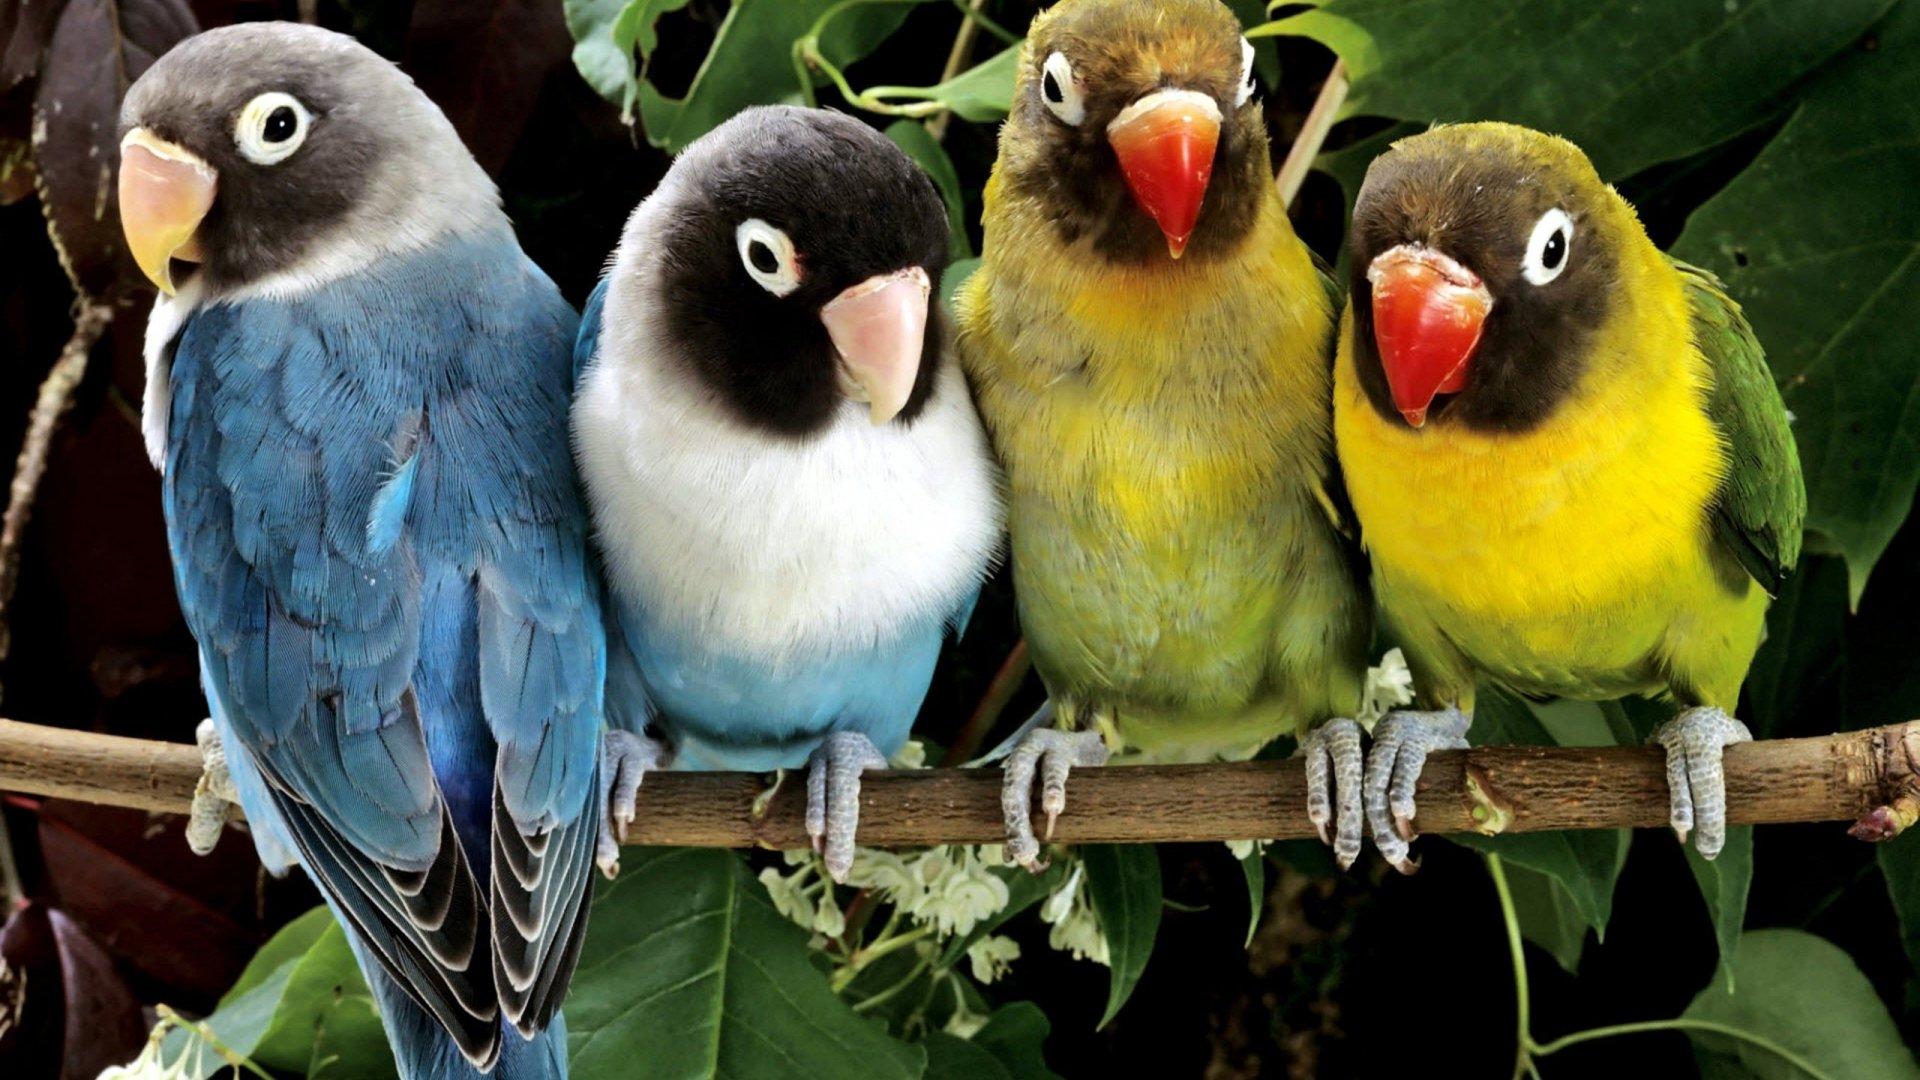 Birds-1920x1080-Need-iPhone-S-Plus-Background-for-IPhoneSPlus-Follow-wallpaper-wp3603347